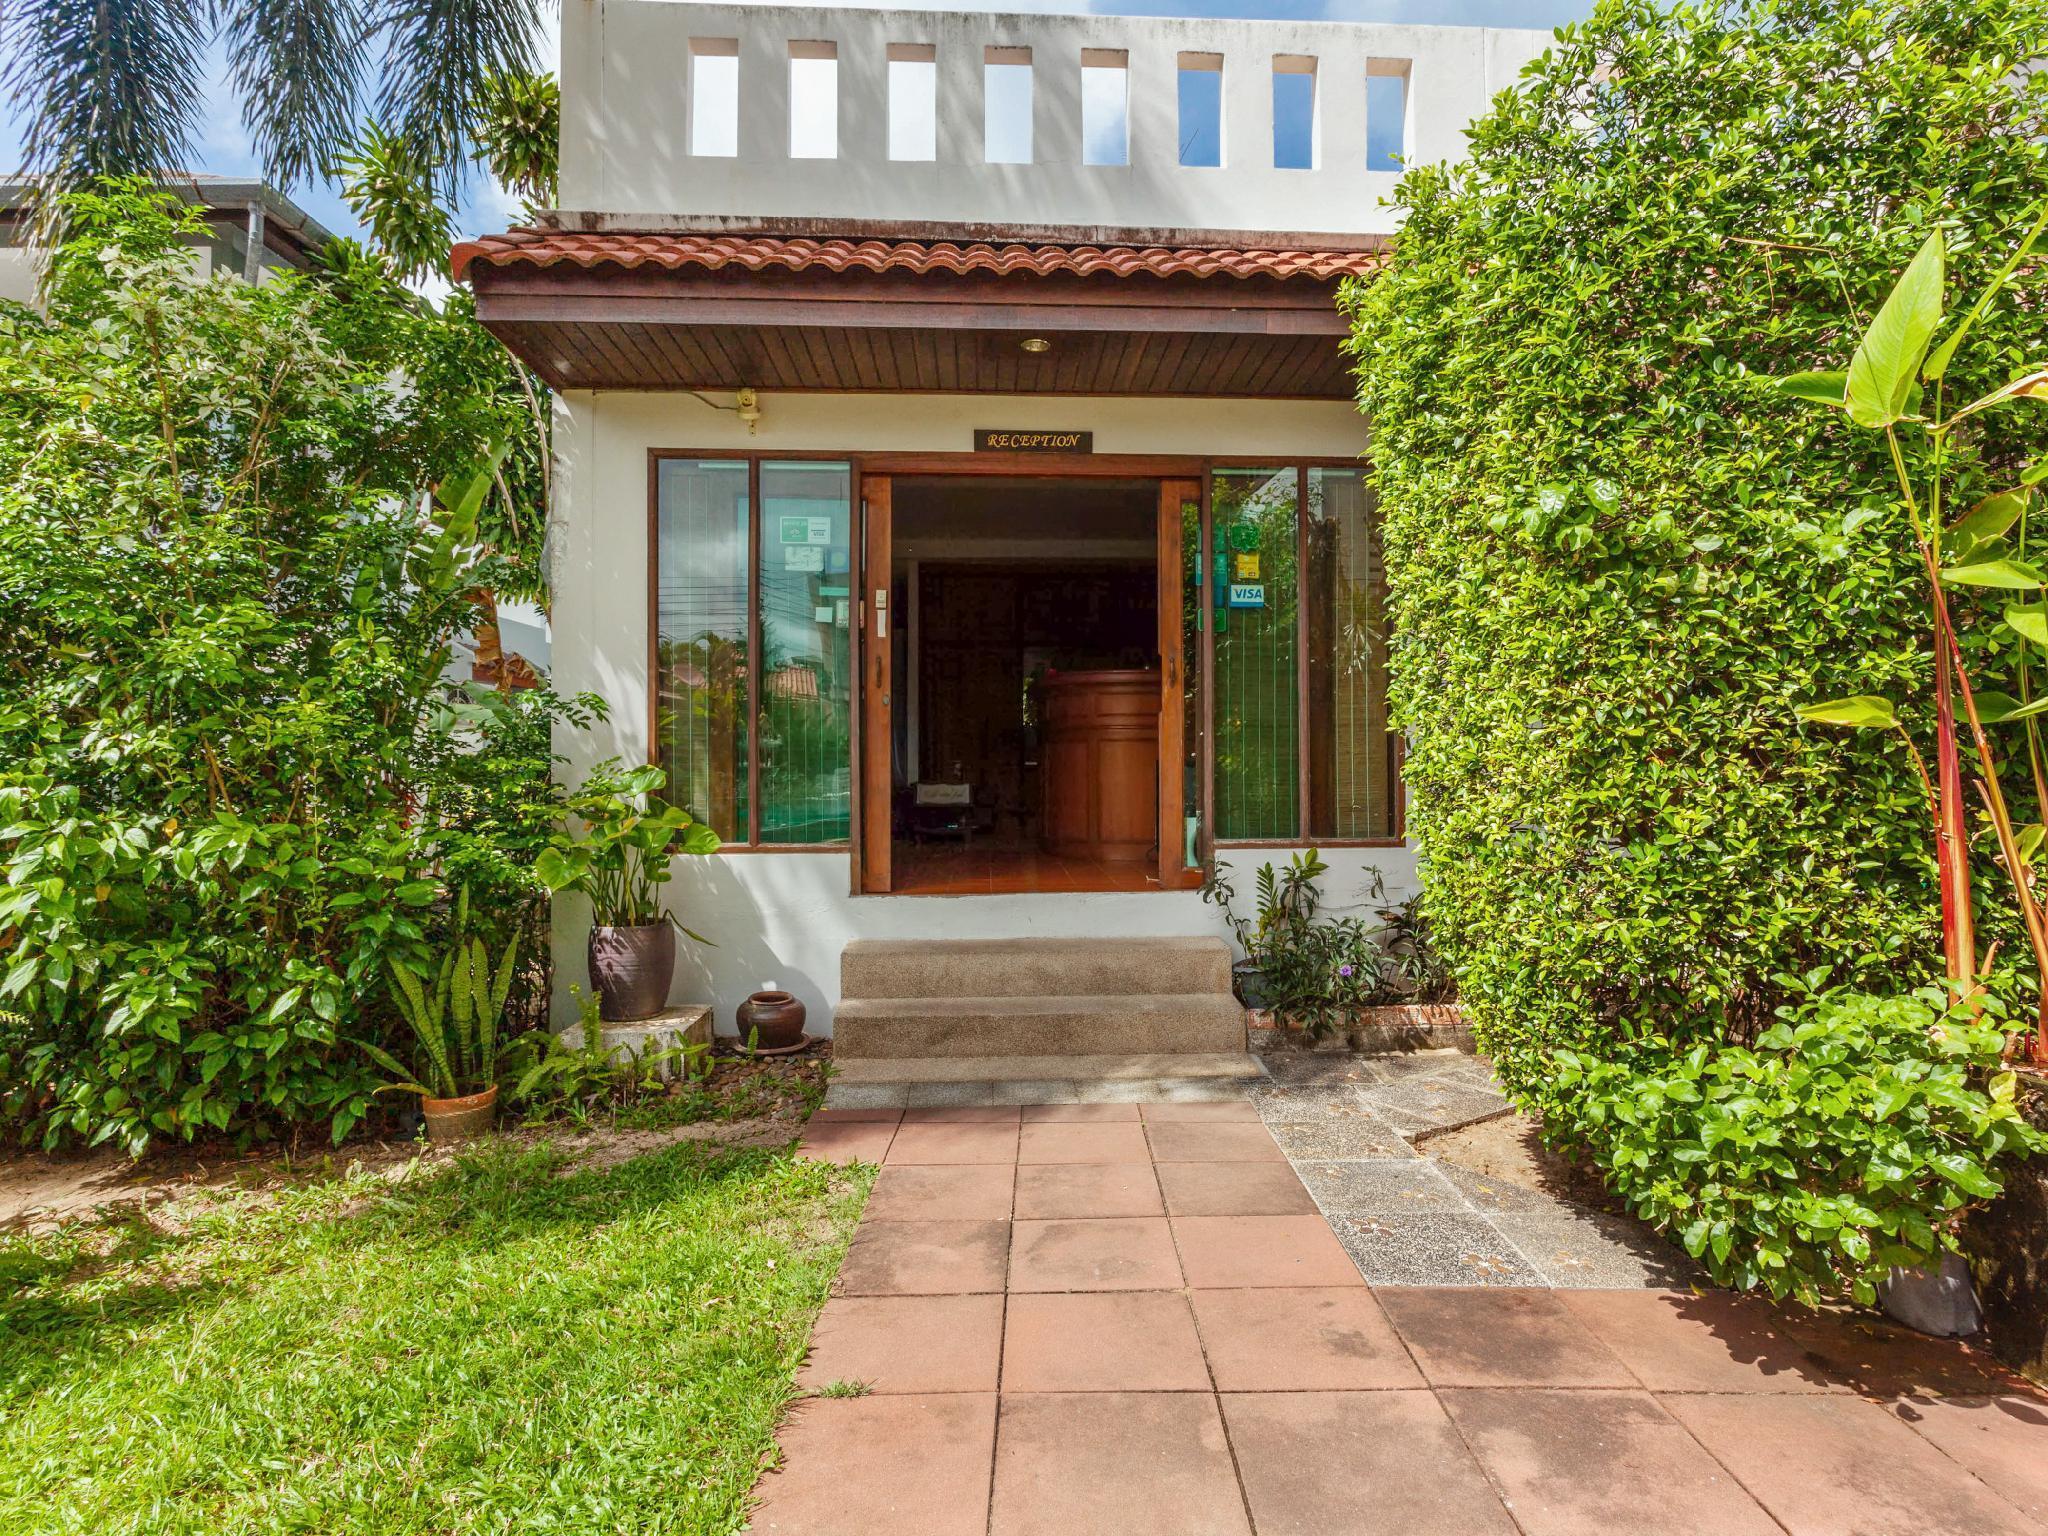 ULOVE Resort, Rawai Beach, Suitable Family/Group อพาร์ตเมนต์ 12 ห้องนอน 21 ห้องน้ำส่วนตัว ขนาด 800 ตร.ม. – หาดราไวย์